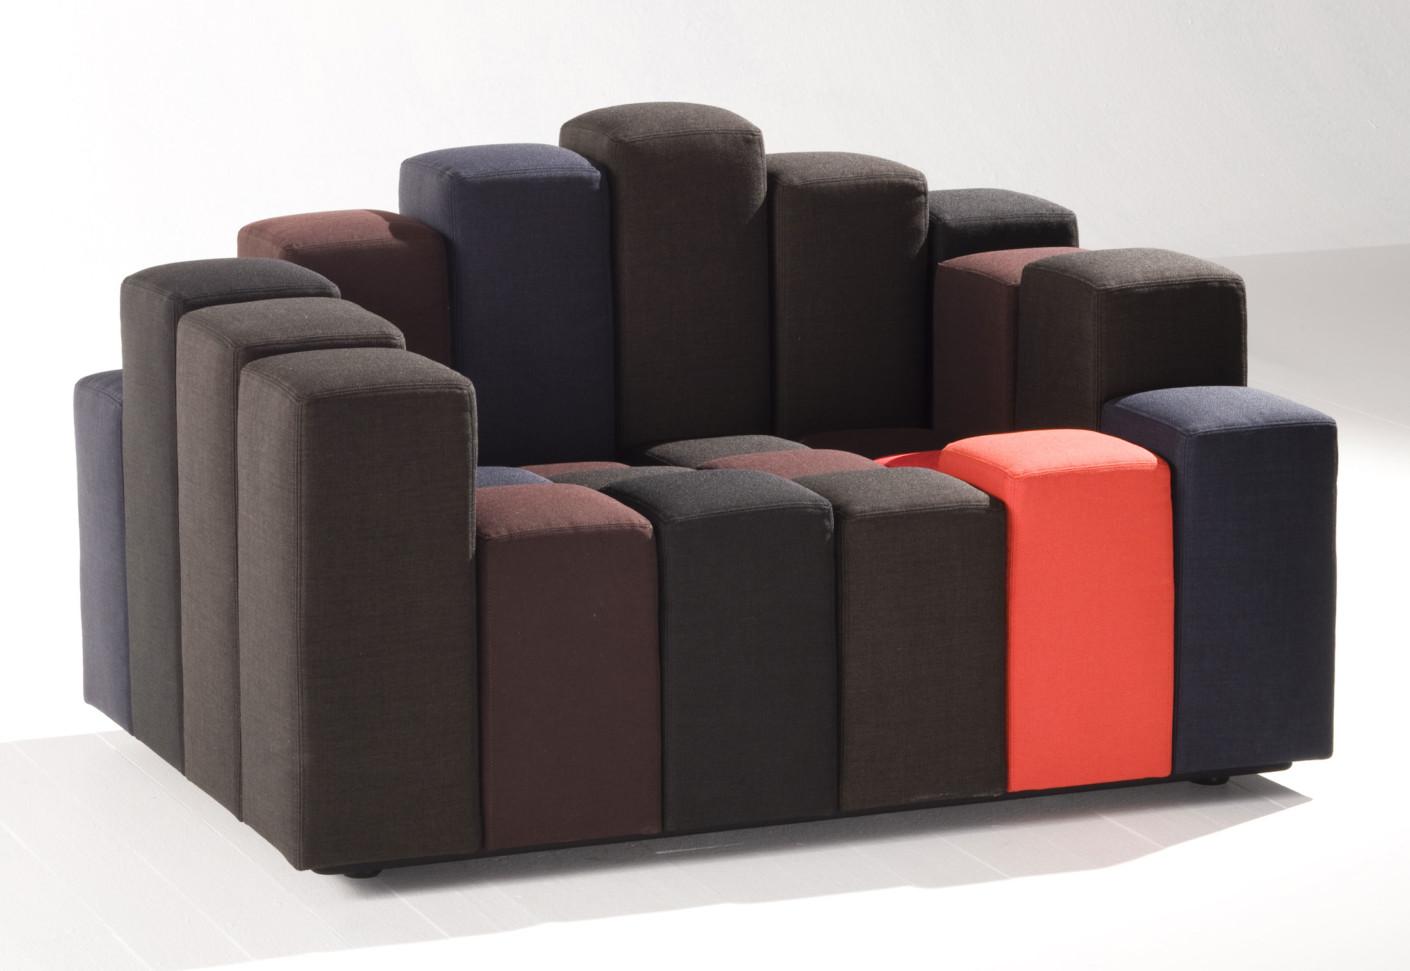 small modular sectional sofas cool sofa costa mesa do-lo-rez 2-seater by moroso | stylepark